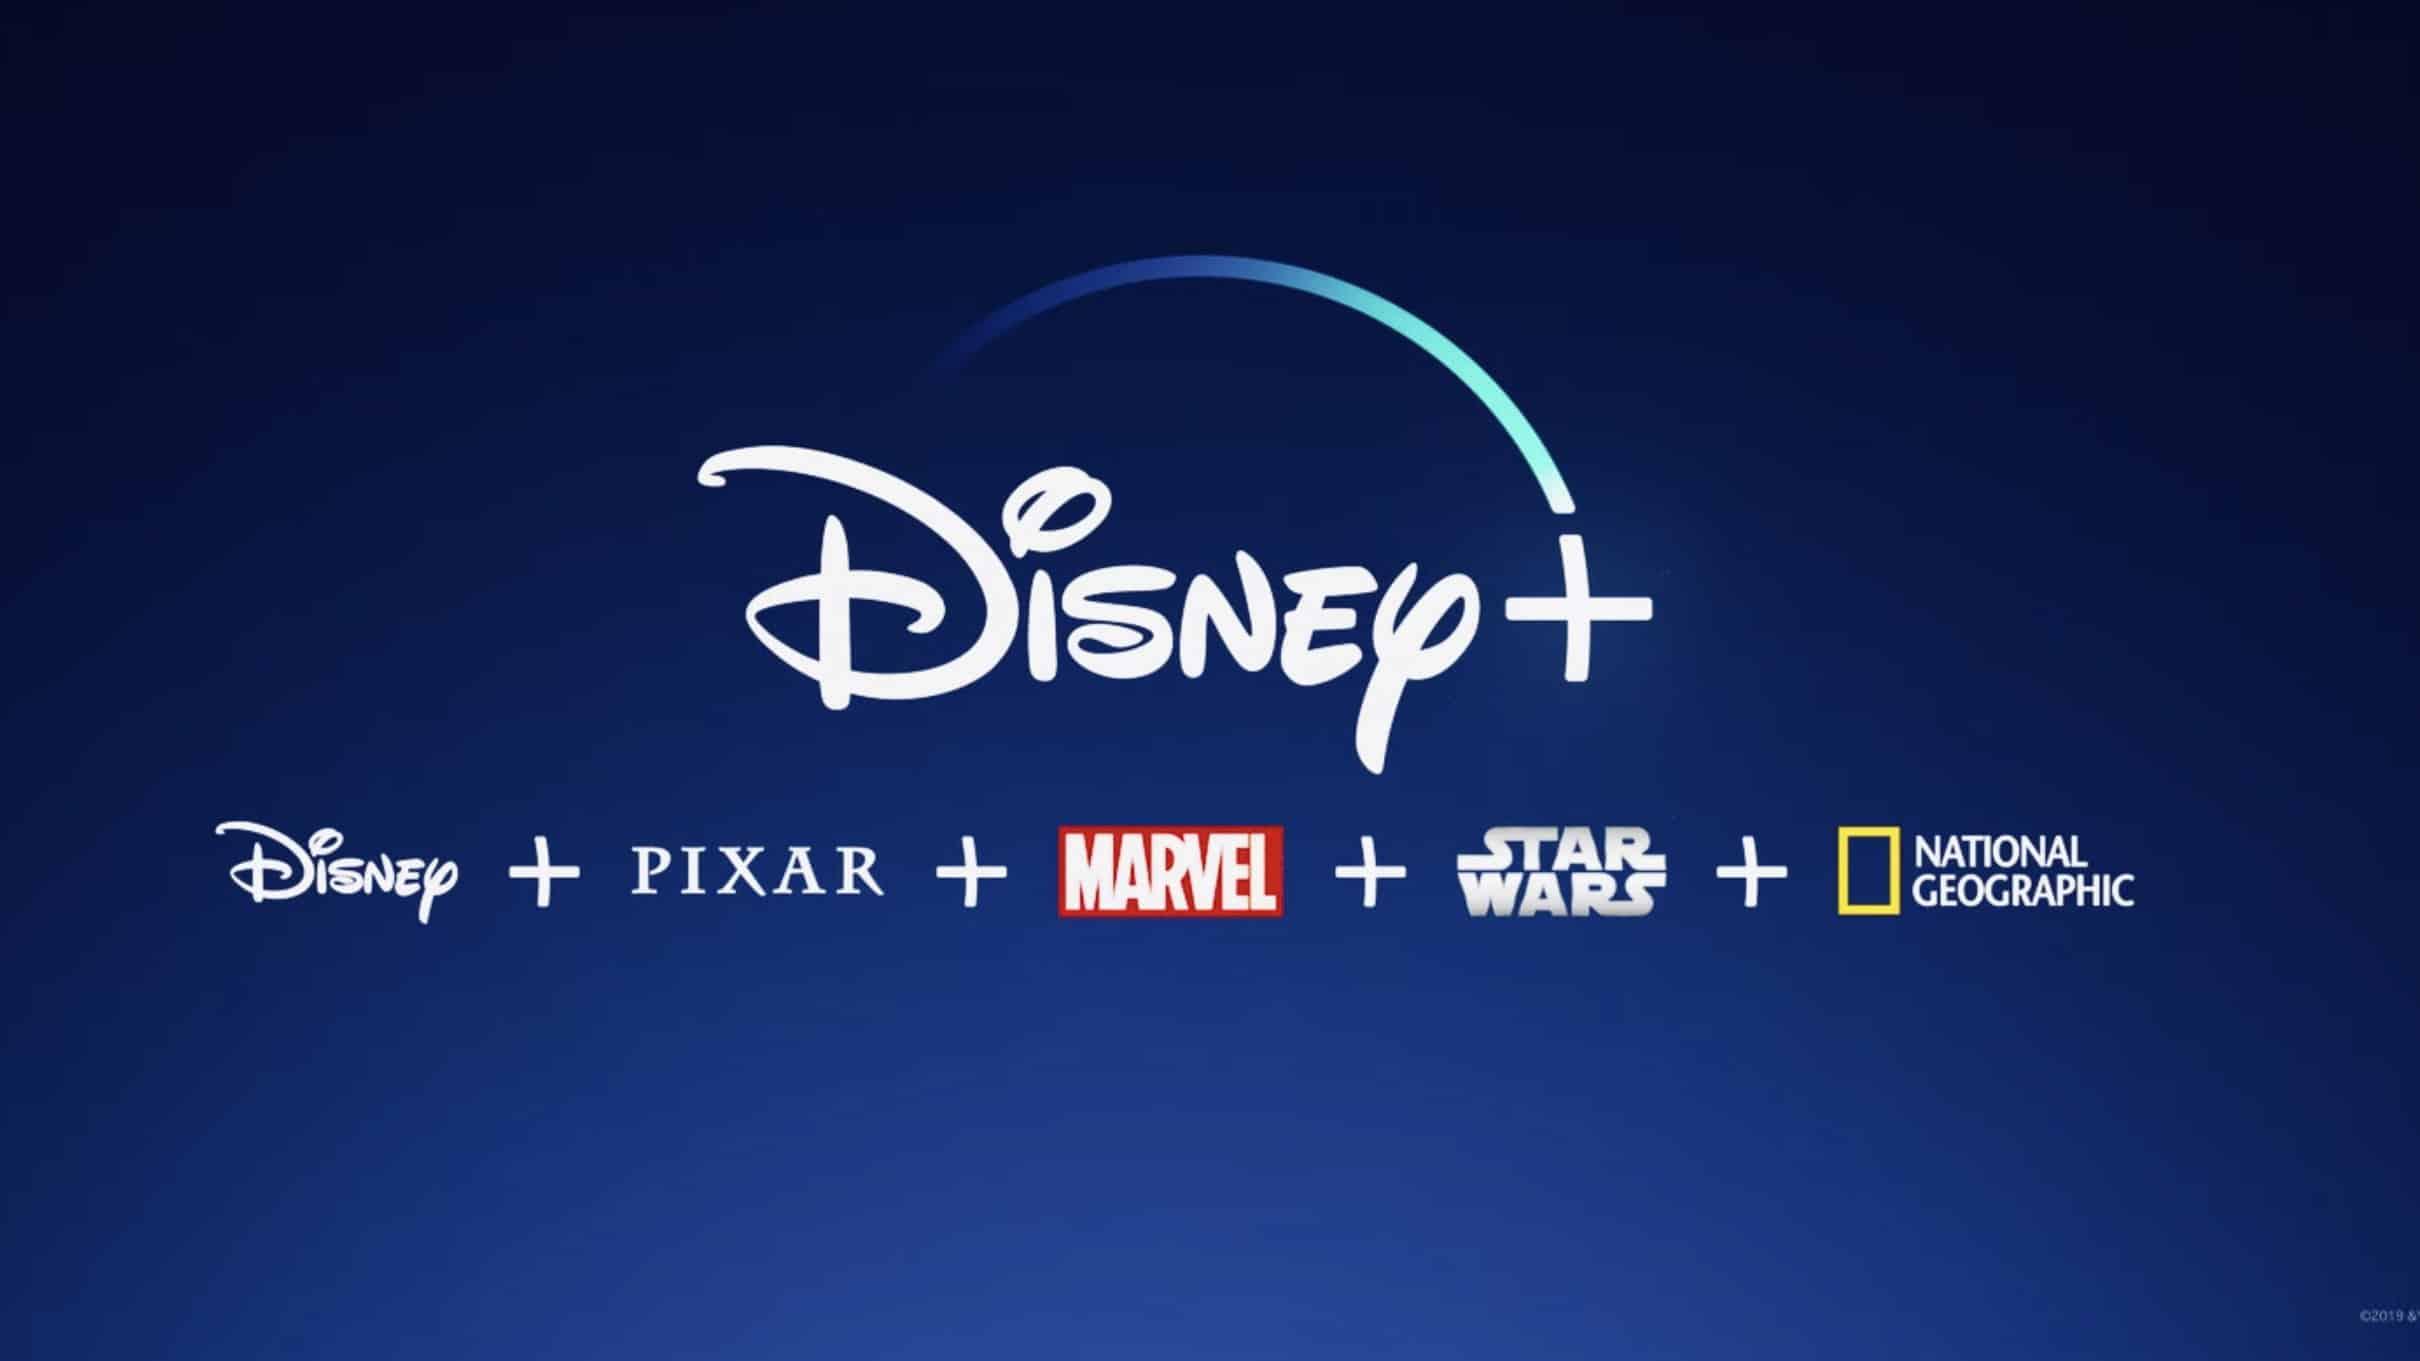 'The Mandalorian' Gets Spinoffs: 'Ahsoka Tano' & 'Rangers of the New Republic'